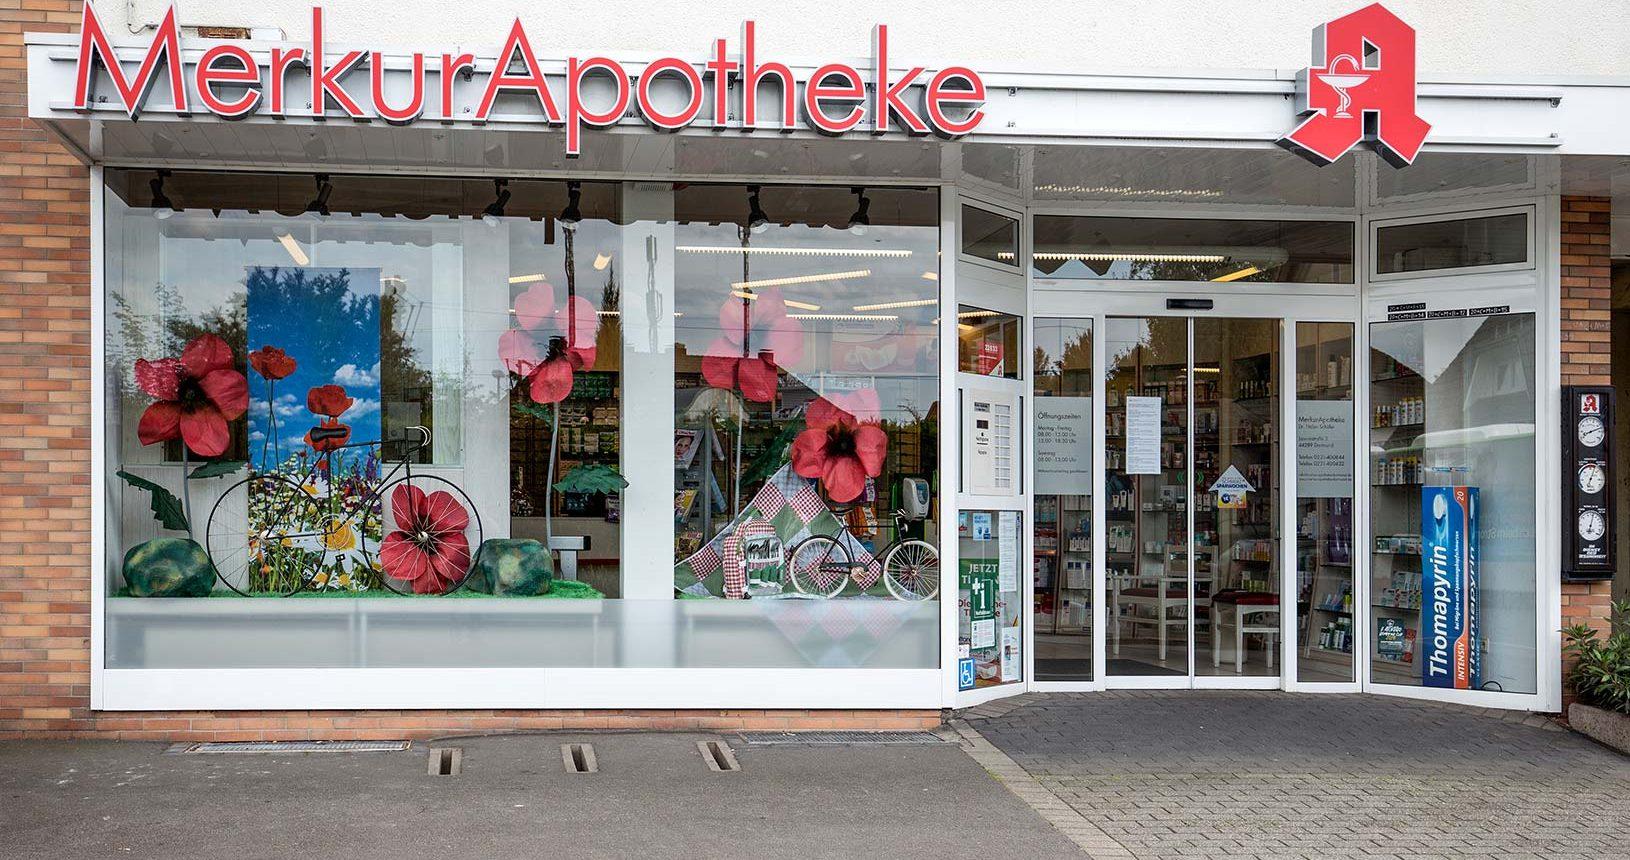 Die Merkur Apotheke in Dortmund Sölde